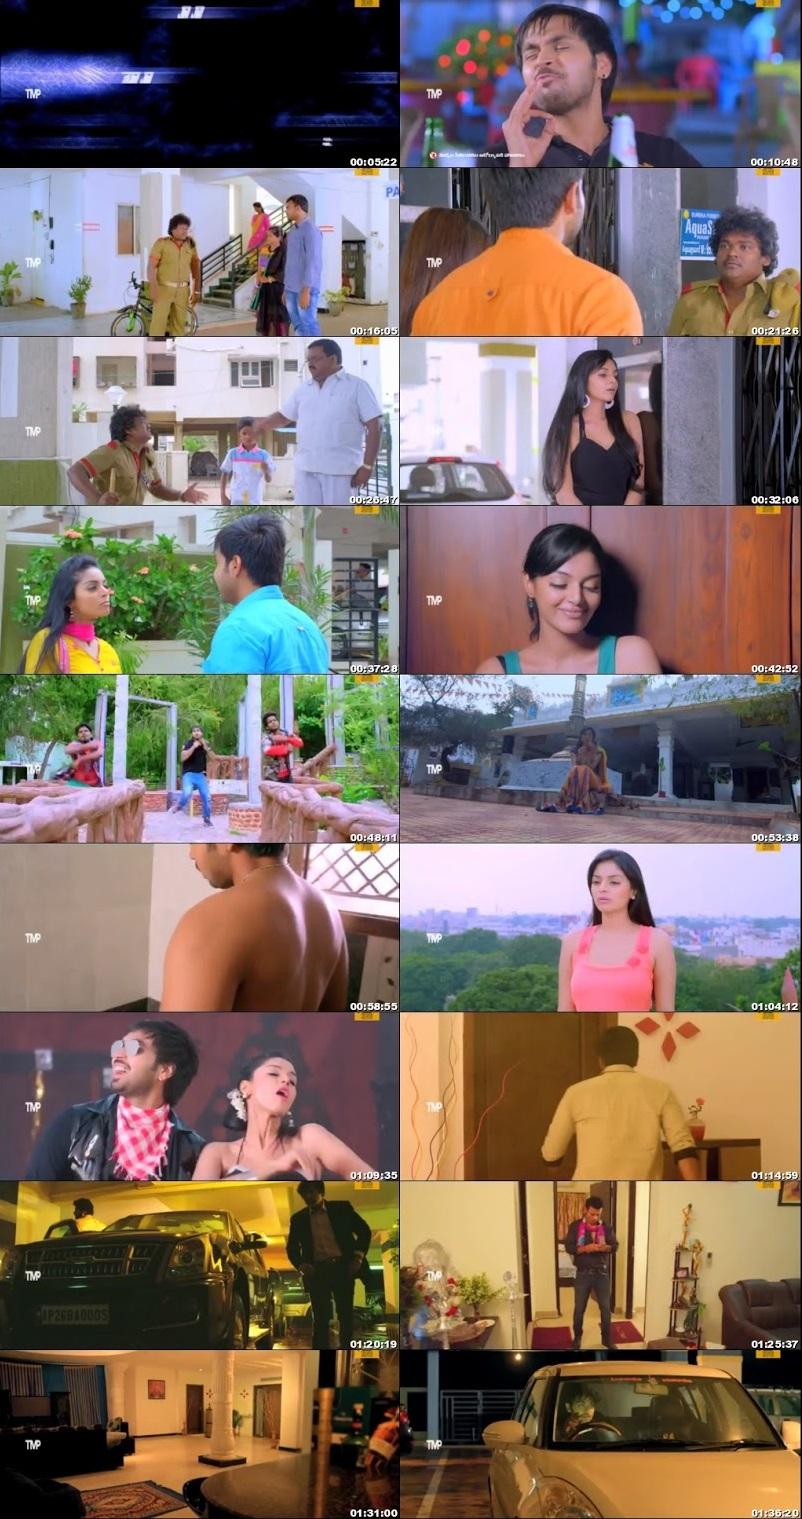 premikudu 2016 full movie download hindi dubbed 720p hdrip 1gb